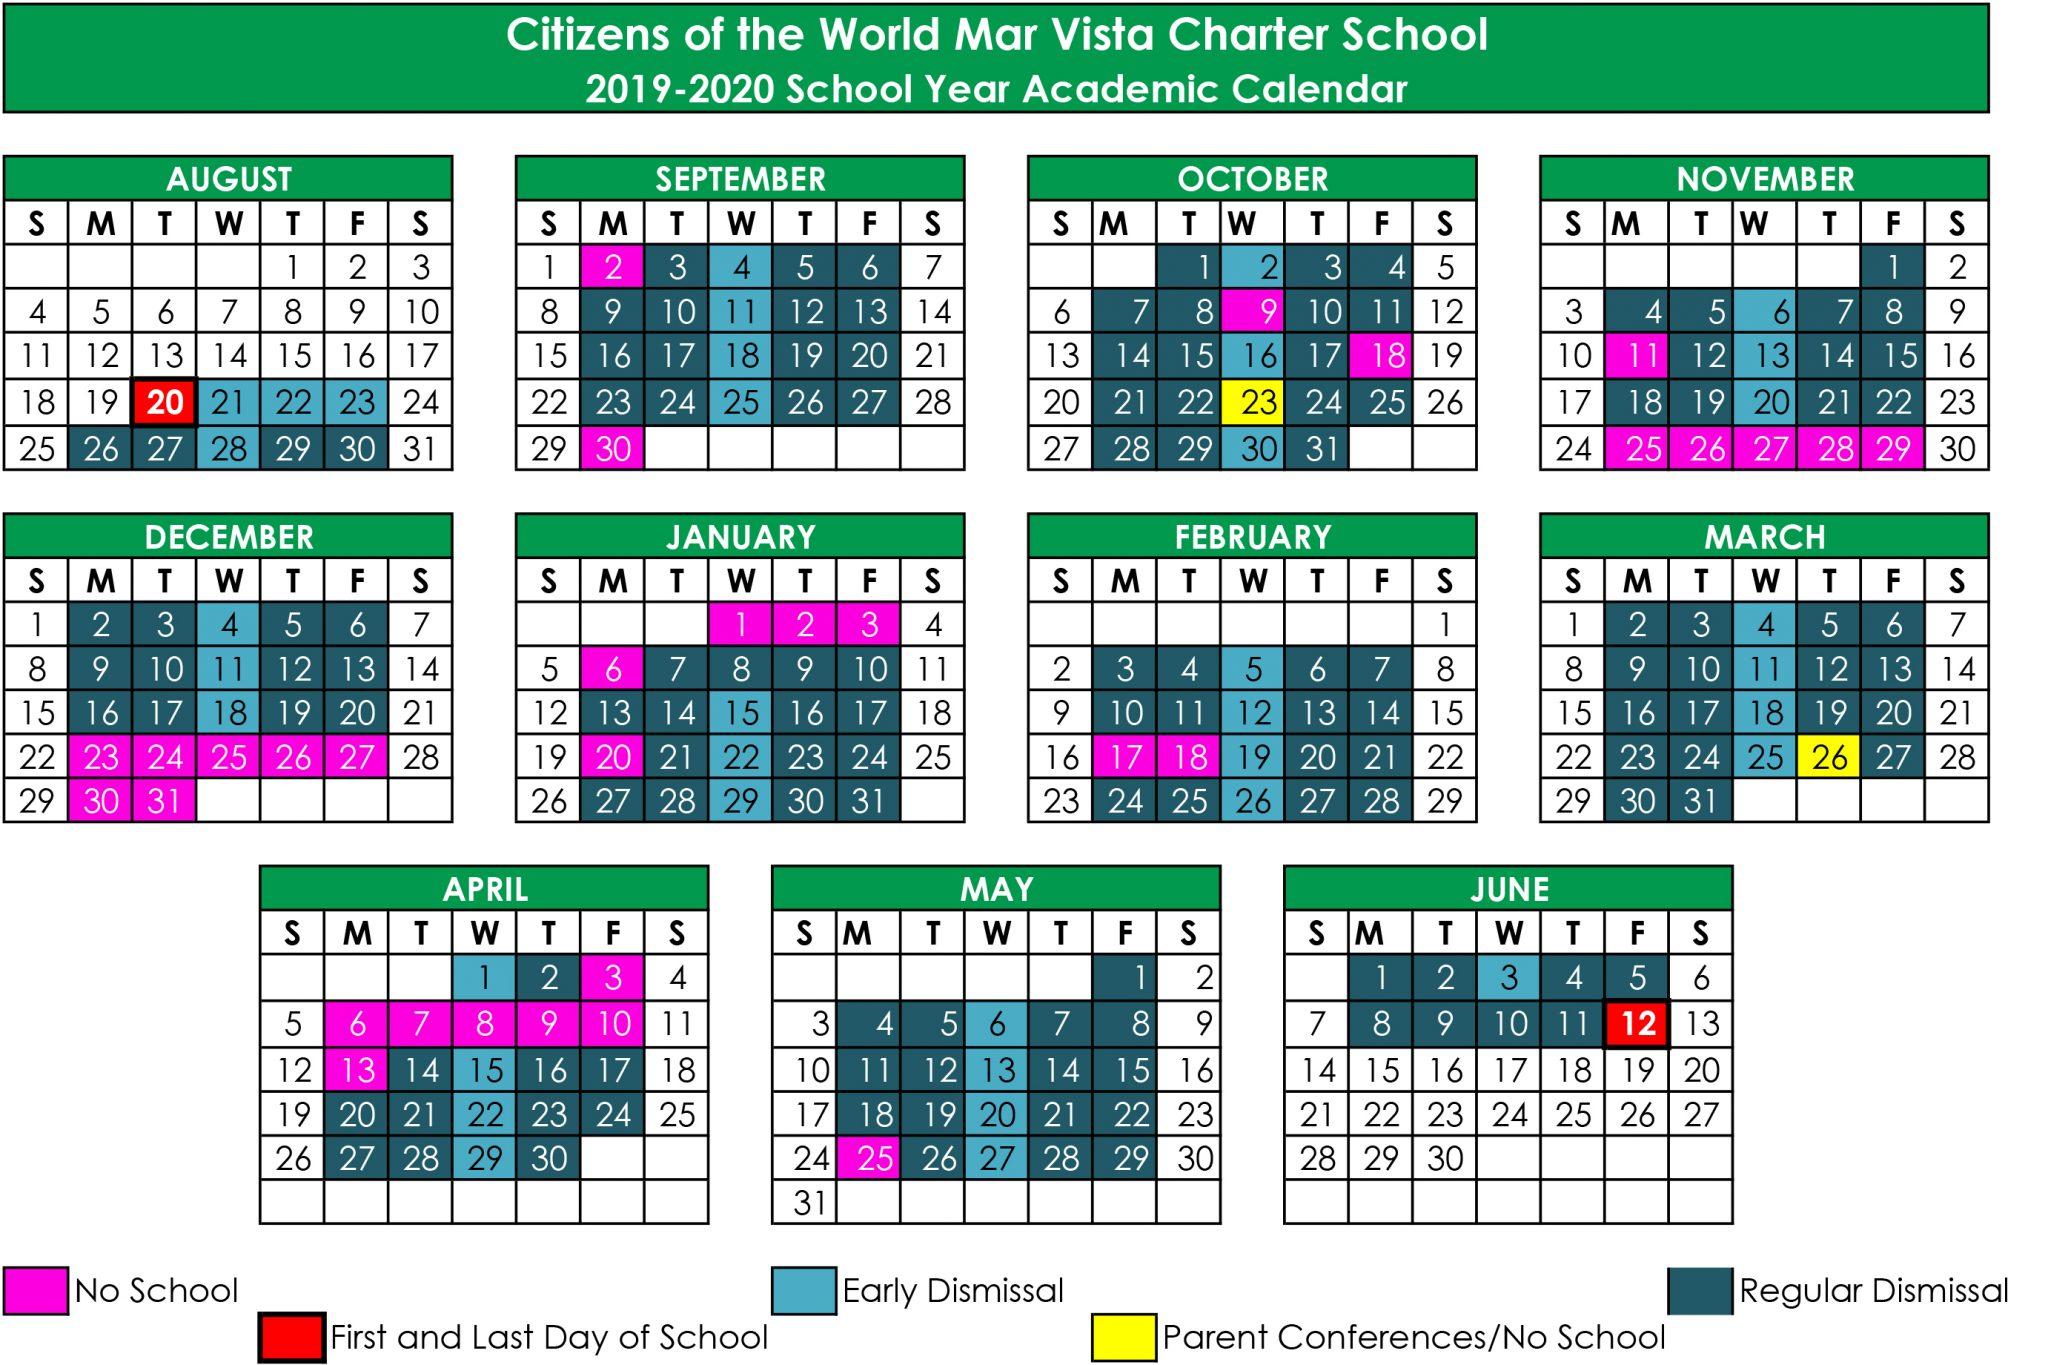 School Calendar | Cwc Mar Vista For Diamond Bar High School Calendar 2020